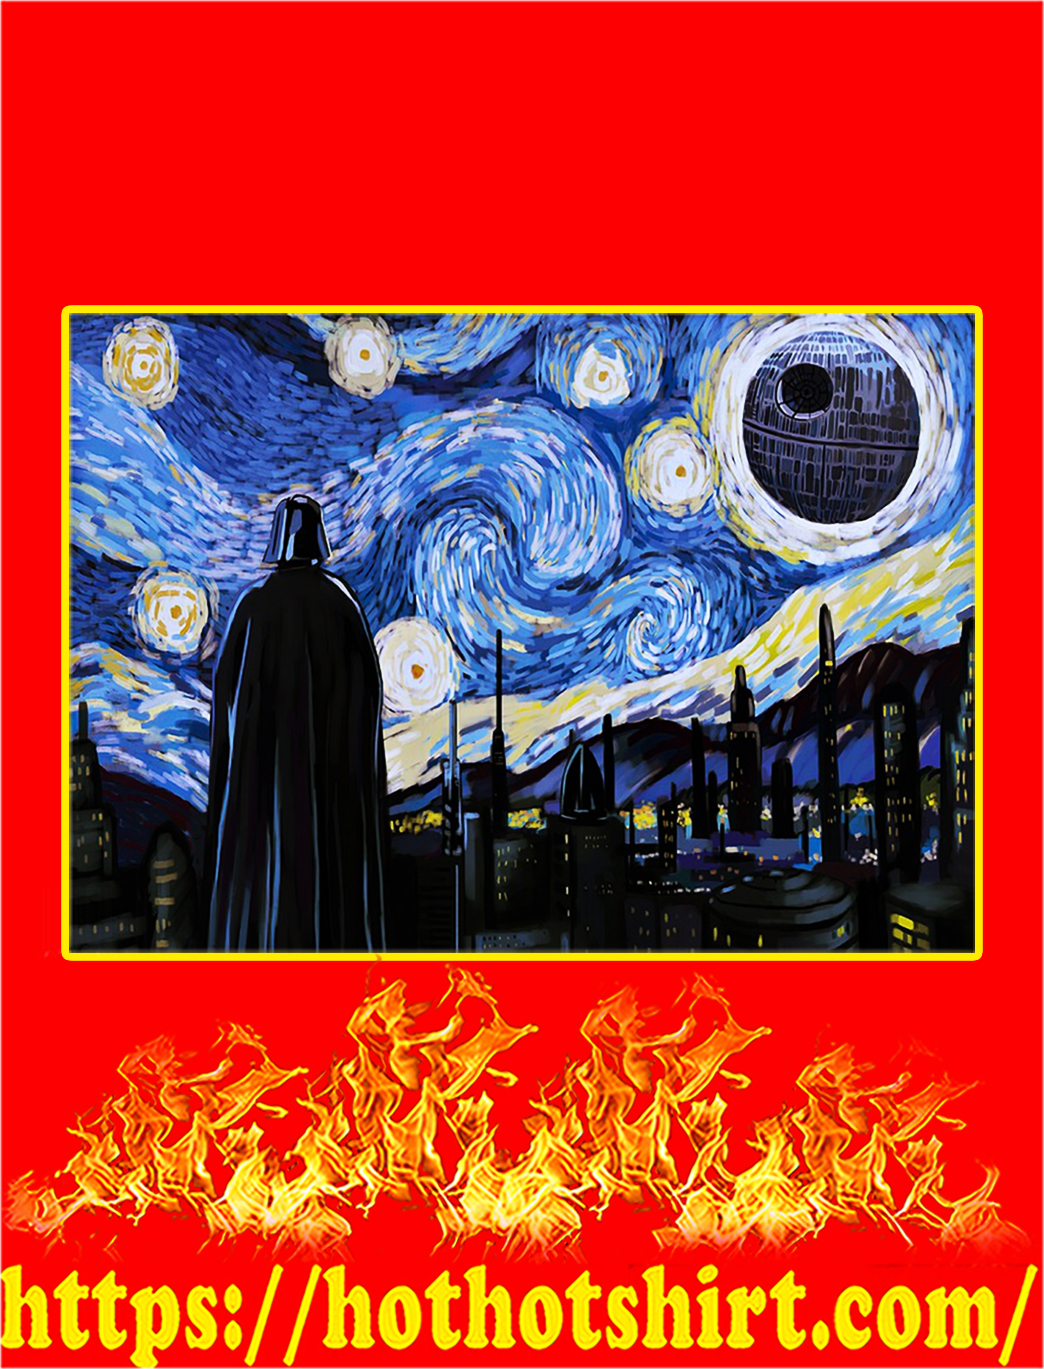 Darth vader starry night poster - A1